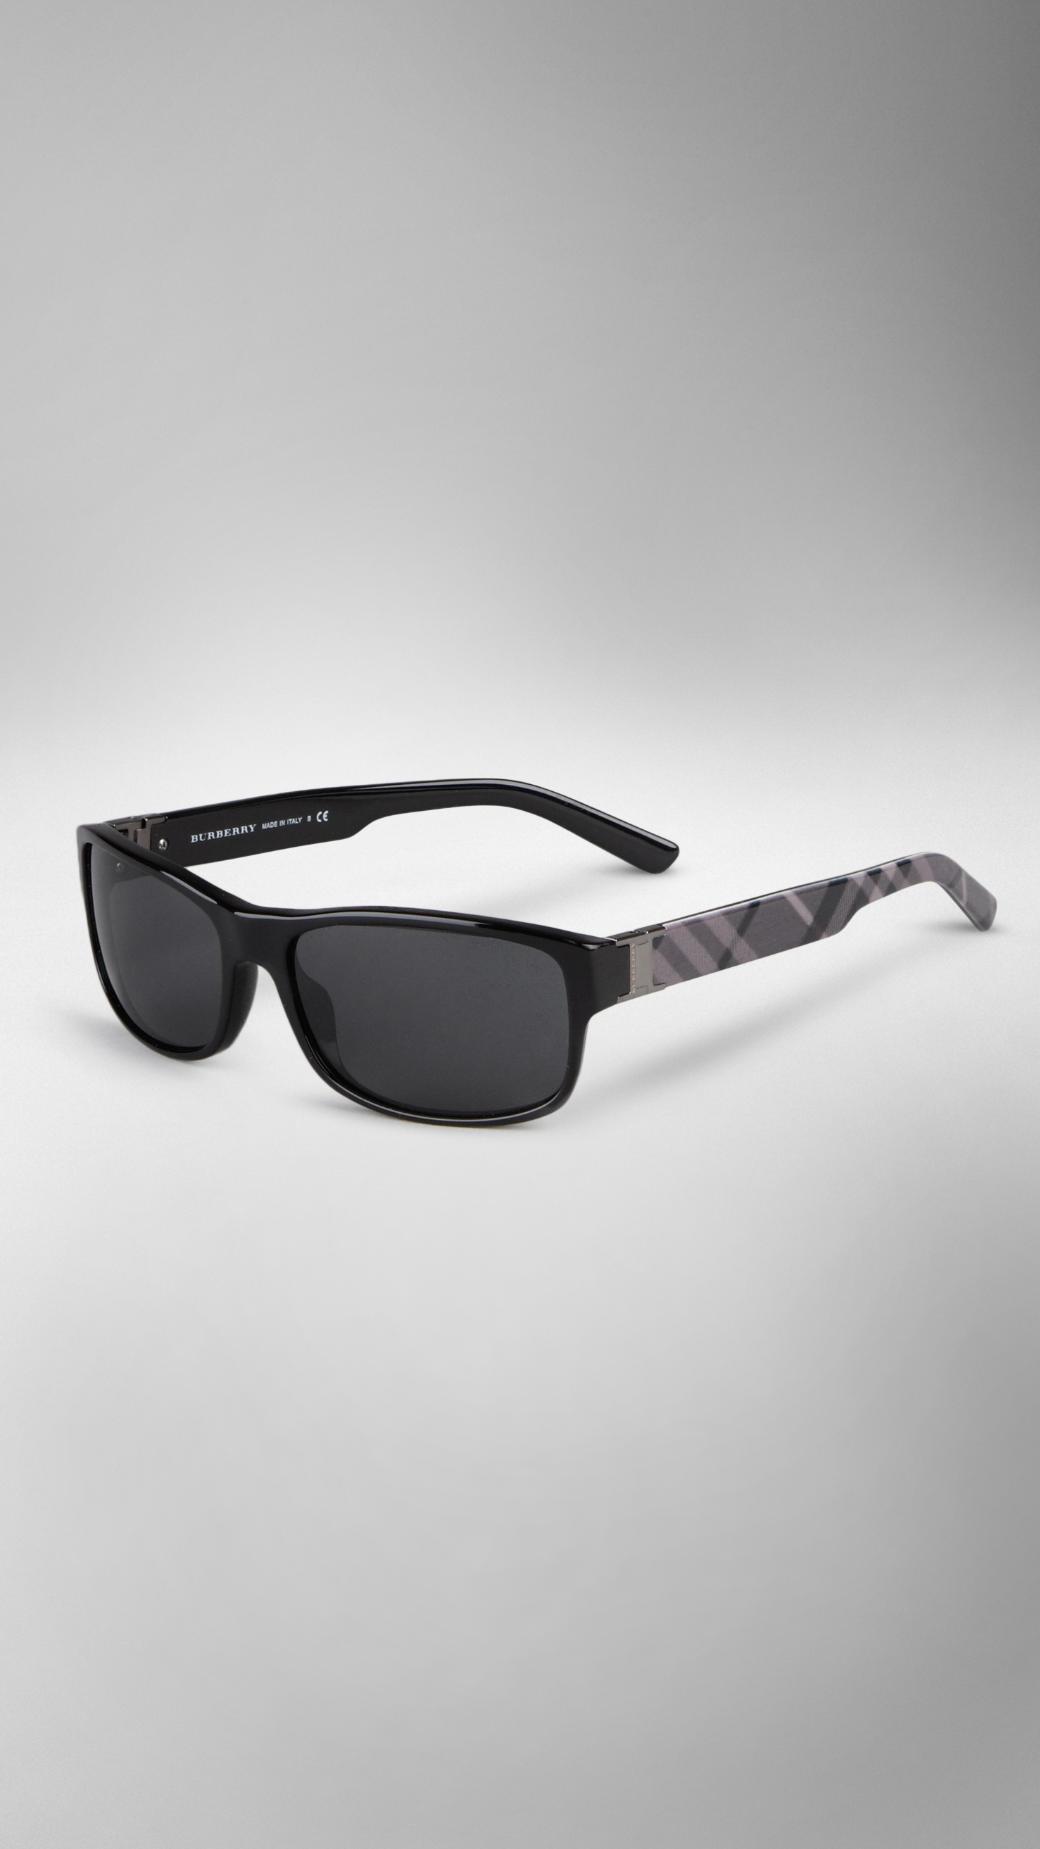 6086a8f6587 Lyst - Burberry Rectangular Frame Check Arm Sunglasses in Black for Men